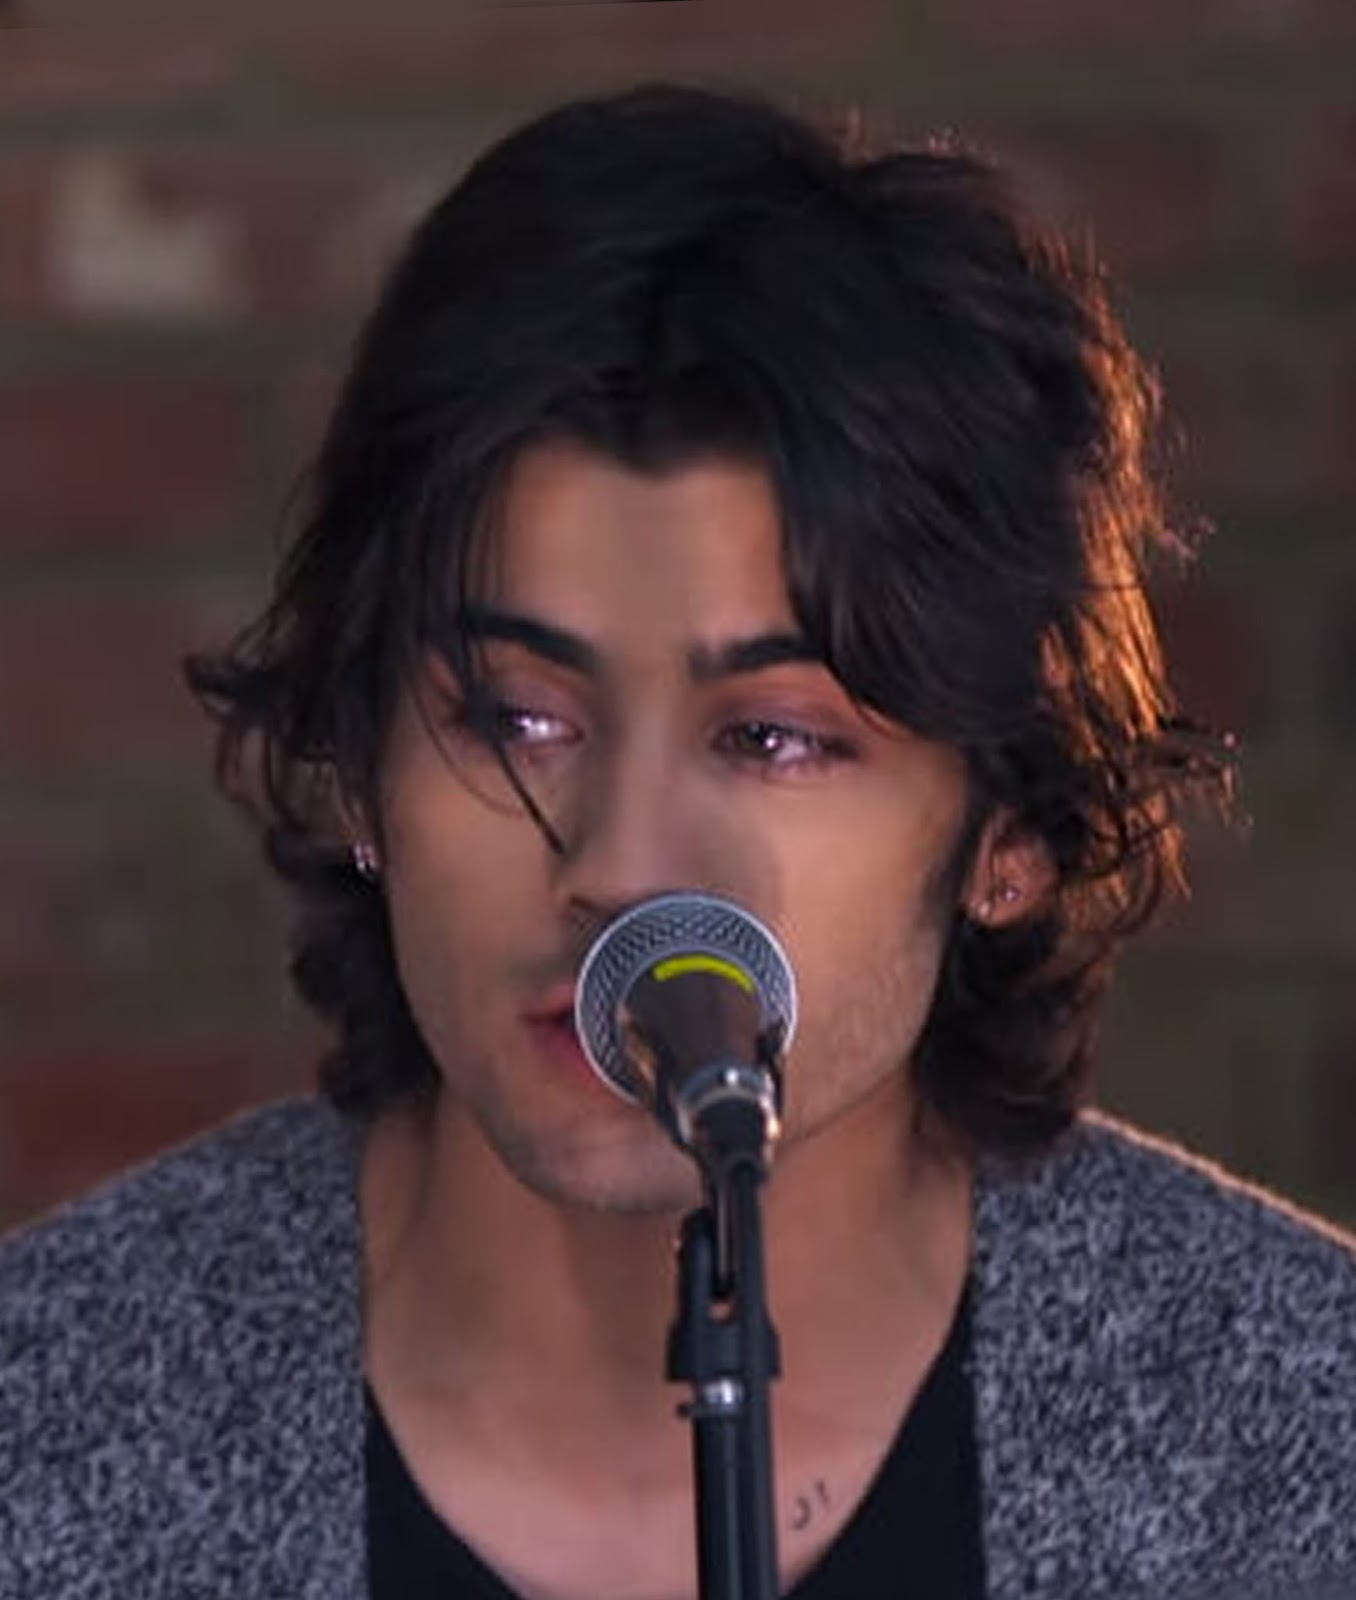 Zayn Malik With Long Hair Hairstyles Spot